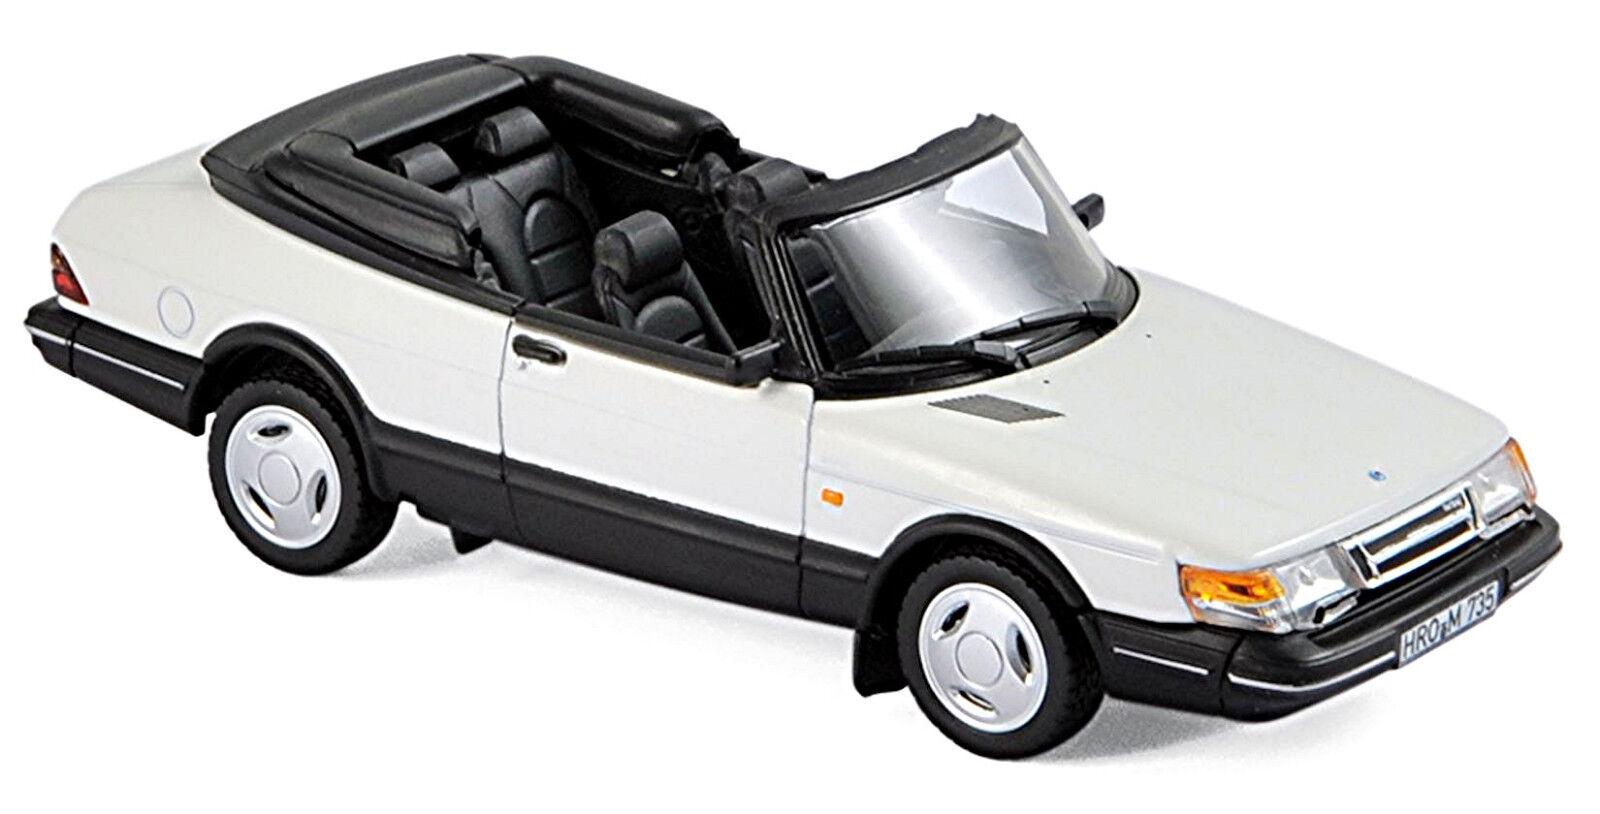 SAAB 900 TURBO 16 Cabriolet 1992 BIANCO 1 43 norev